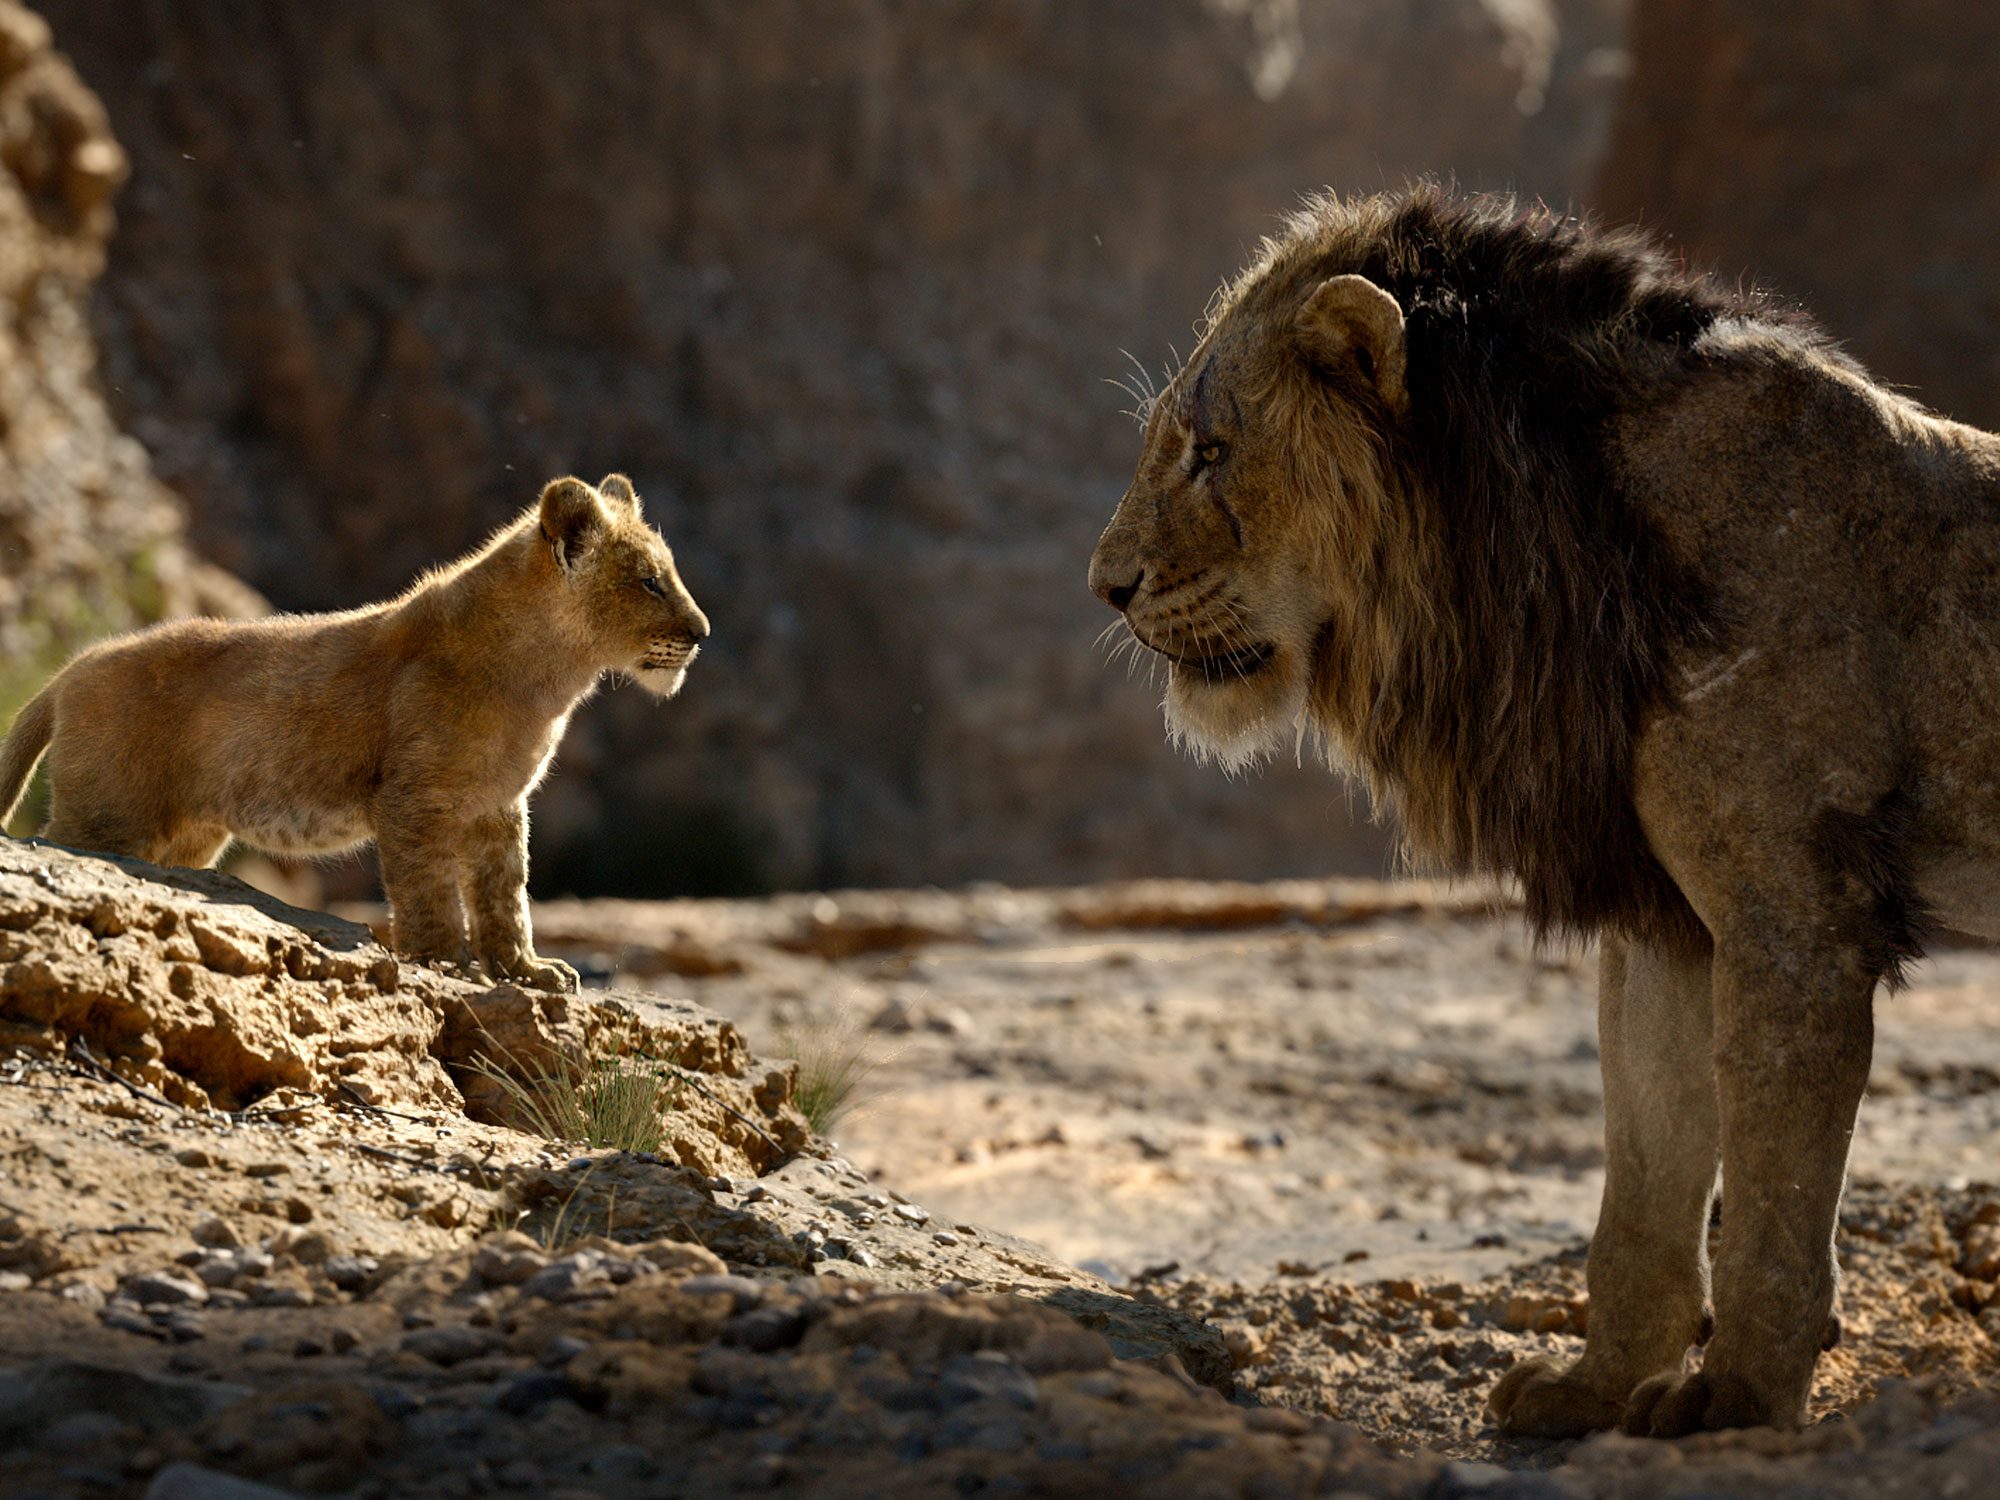 the-lion-king-simba-scar - Little White Lies